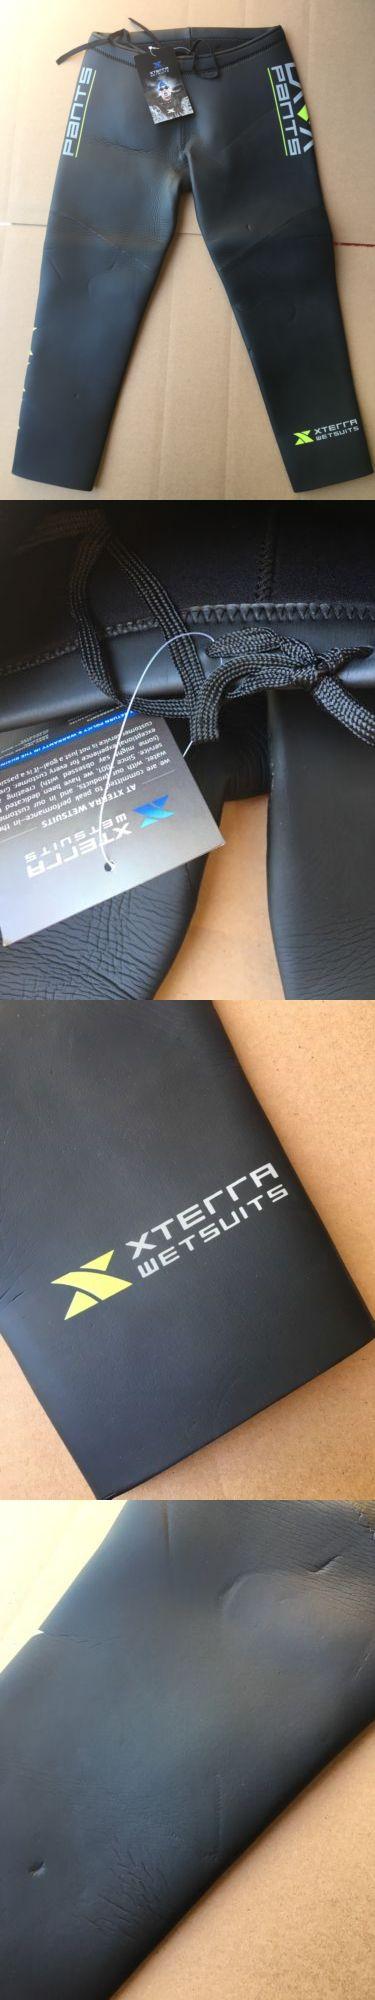 Triathlon 2918: Nwt Xterra Wetsuits Lava Pants S -> BUY IT NOW ONLY: $89.99 on eBay!